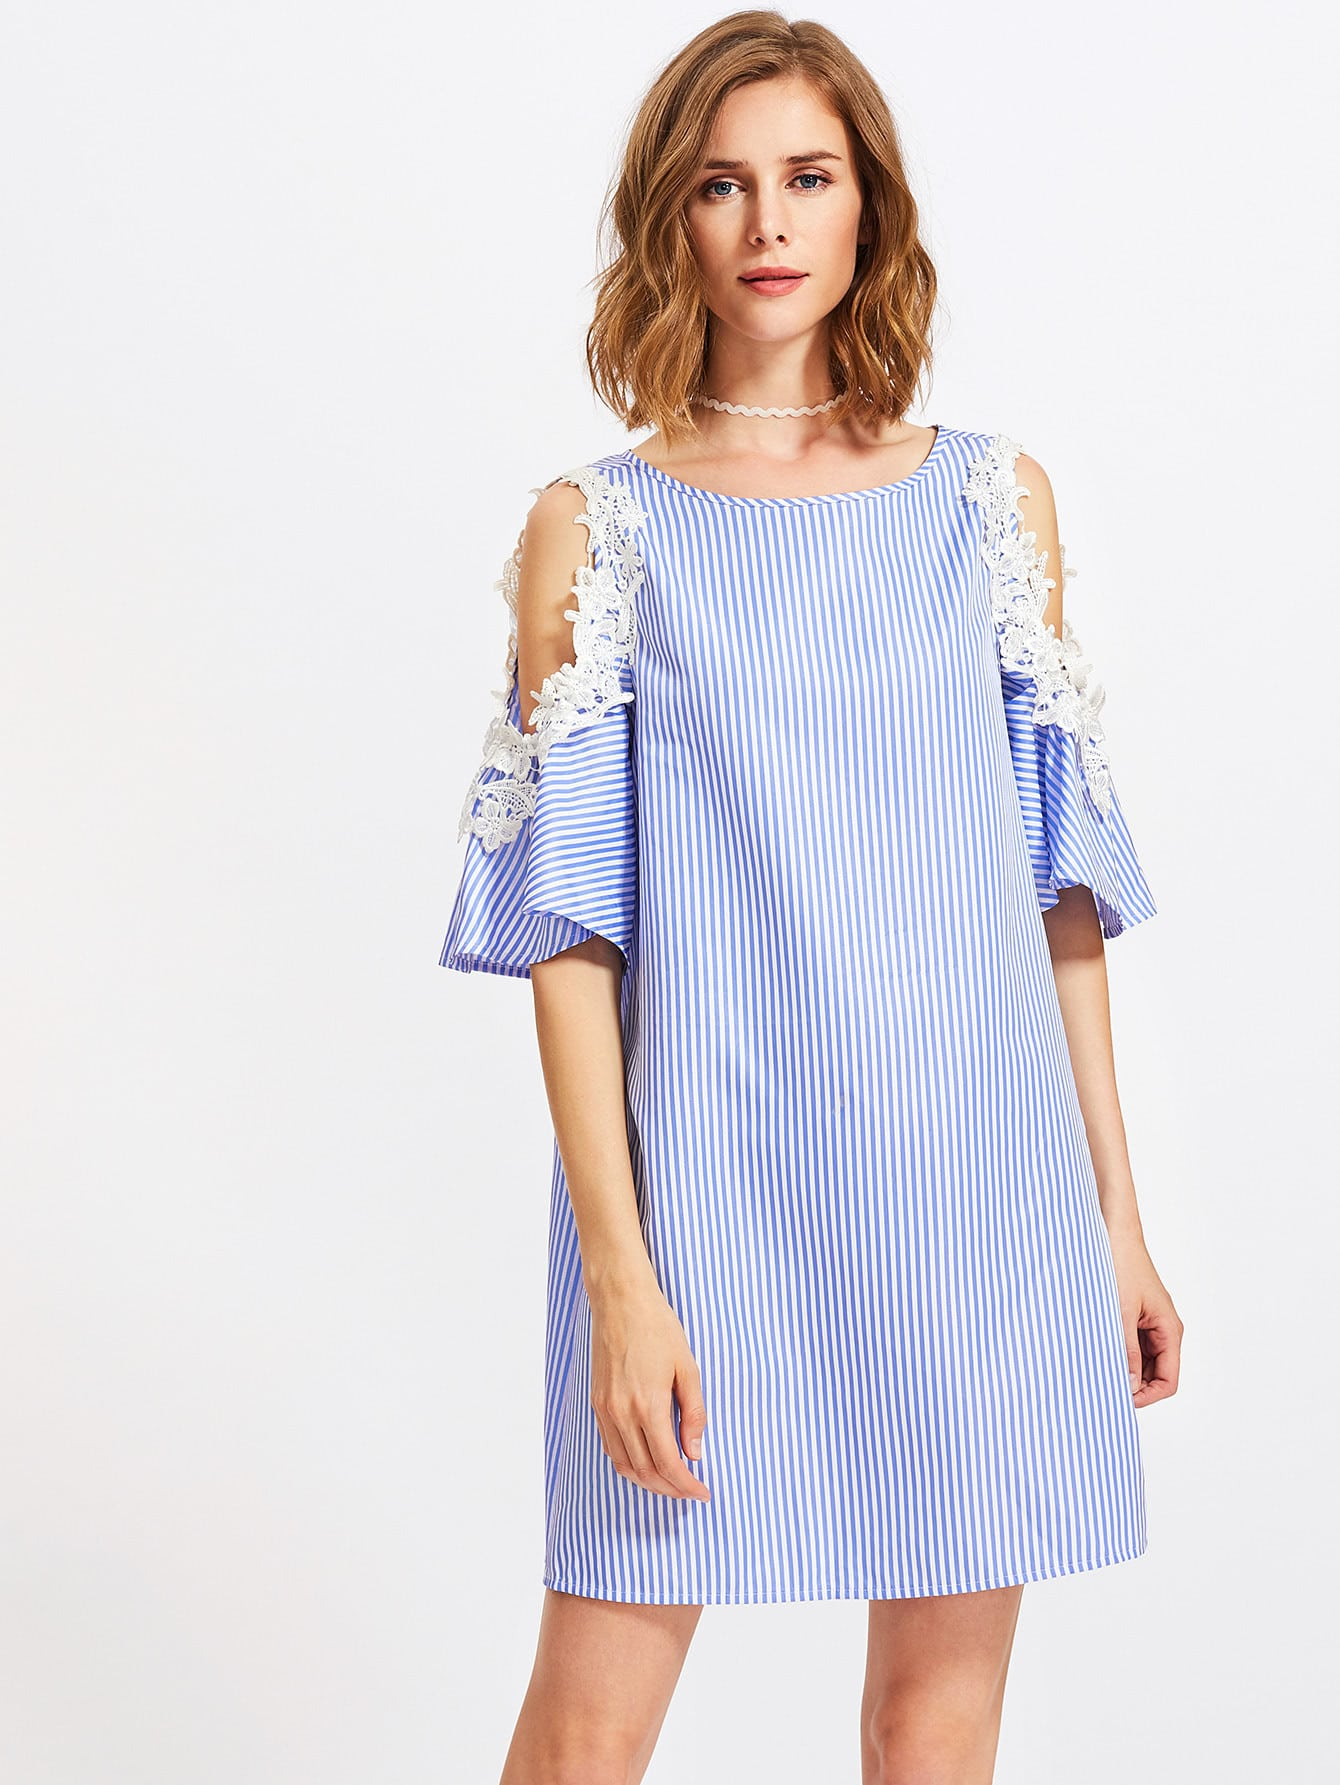 f9c336006c4 Lace Applique Open Shoulder Bell Sleeve Dress EmmaCloth-Women Fast ...